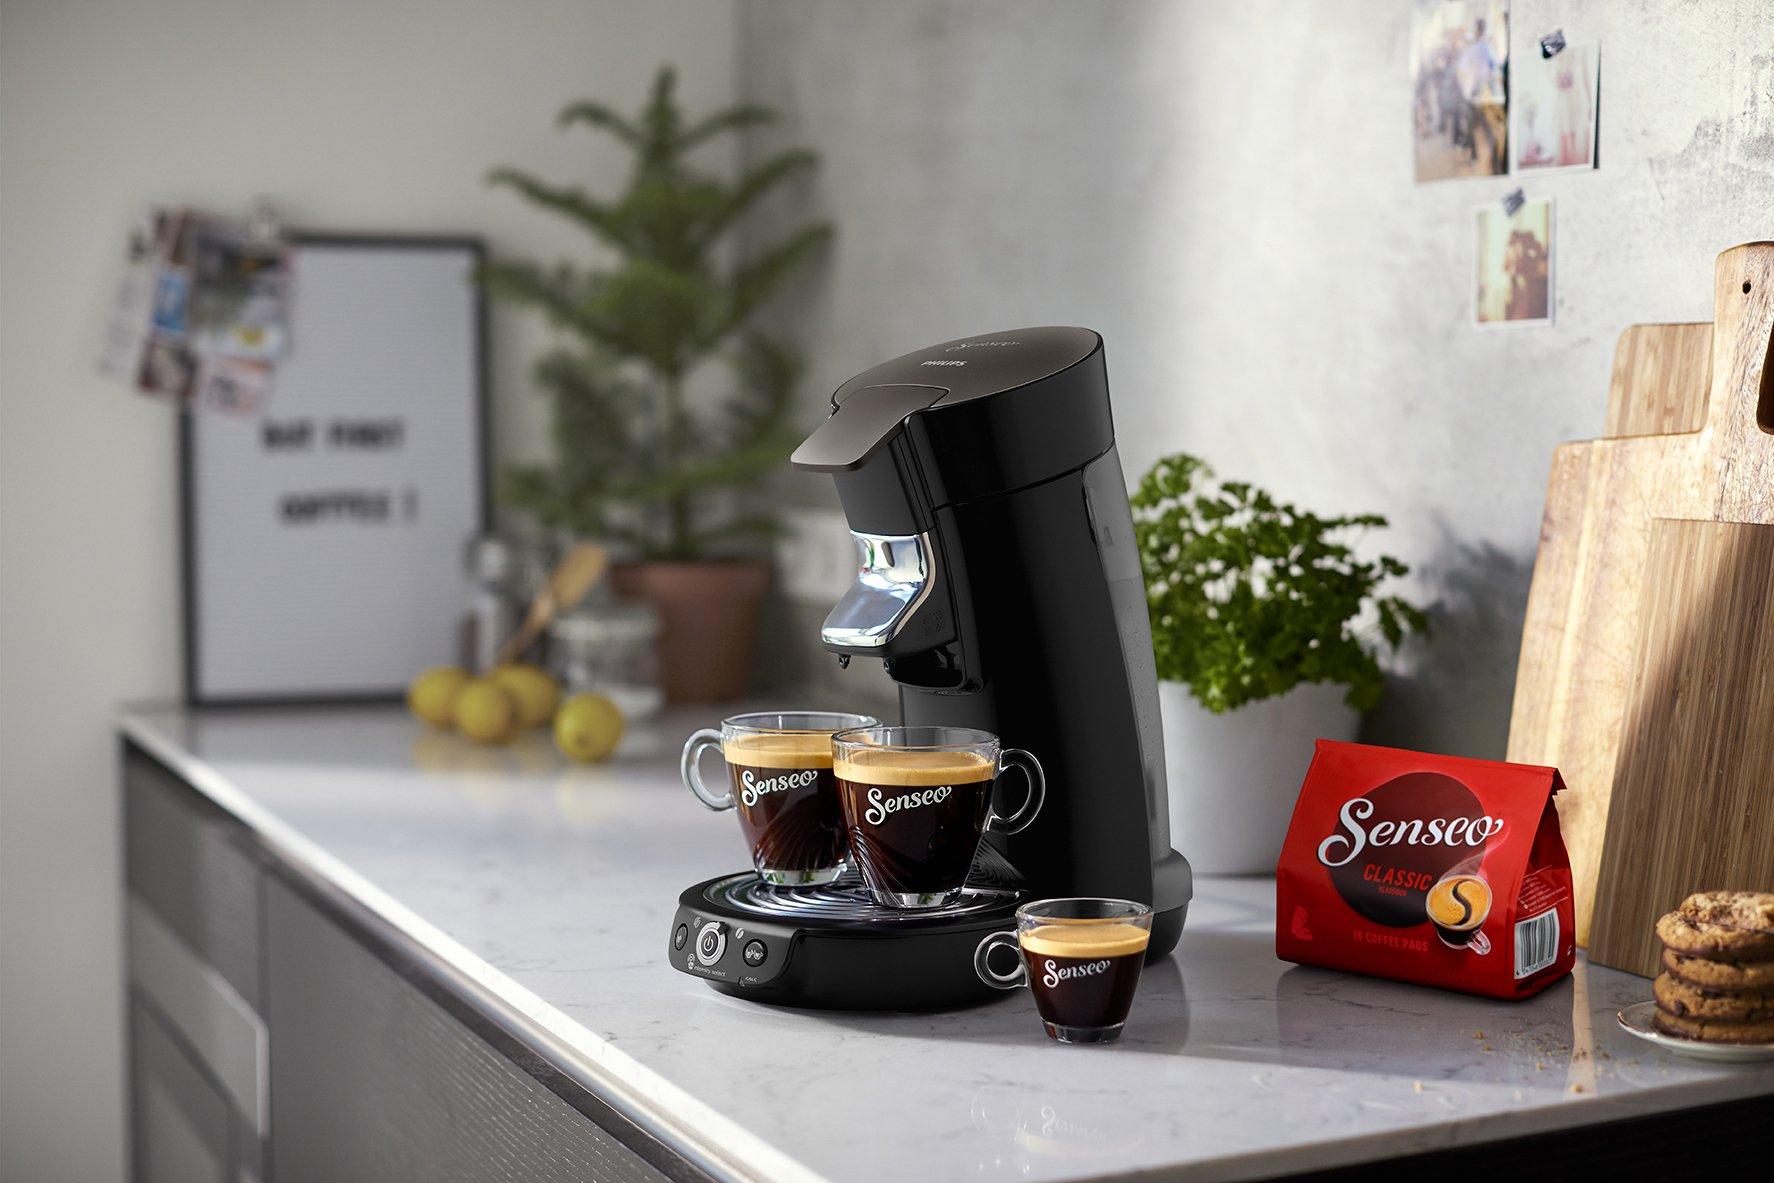 Philips-Senseo-HD656460Viva-Caf-Kaffeepadmaschine-1450-schwarz